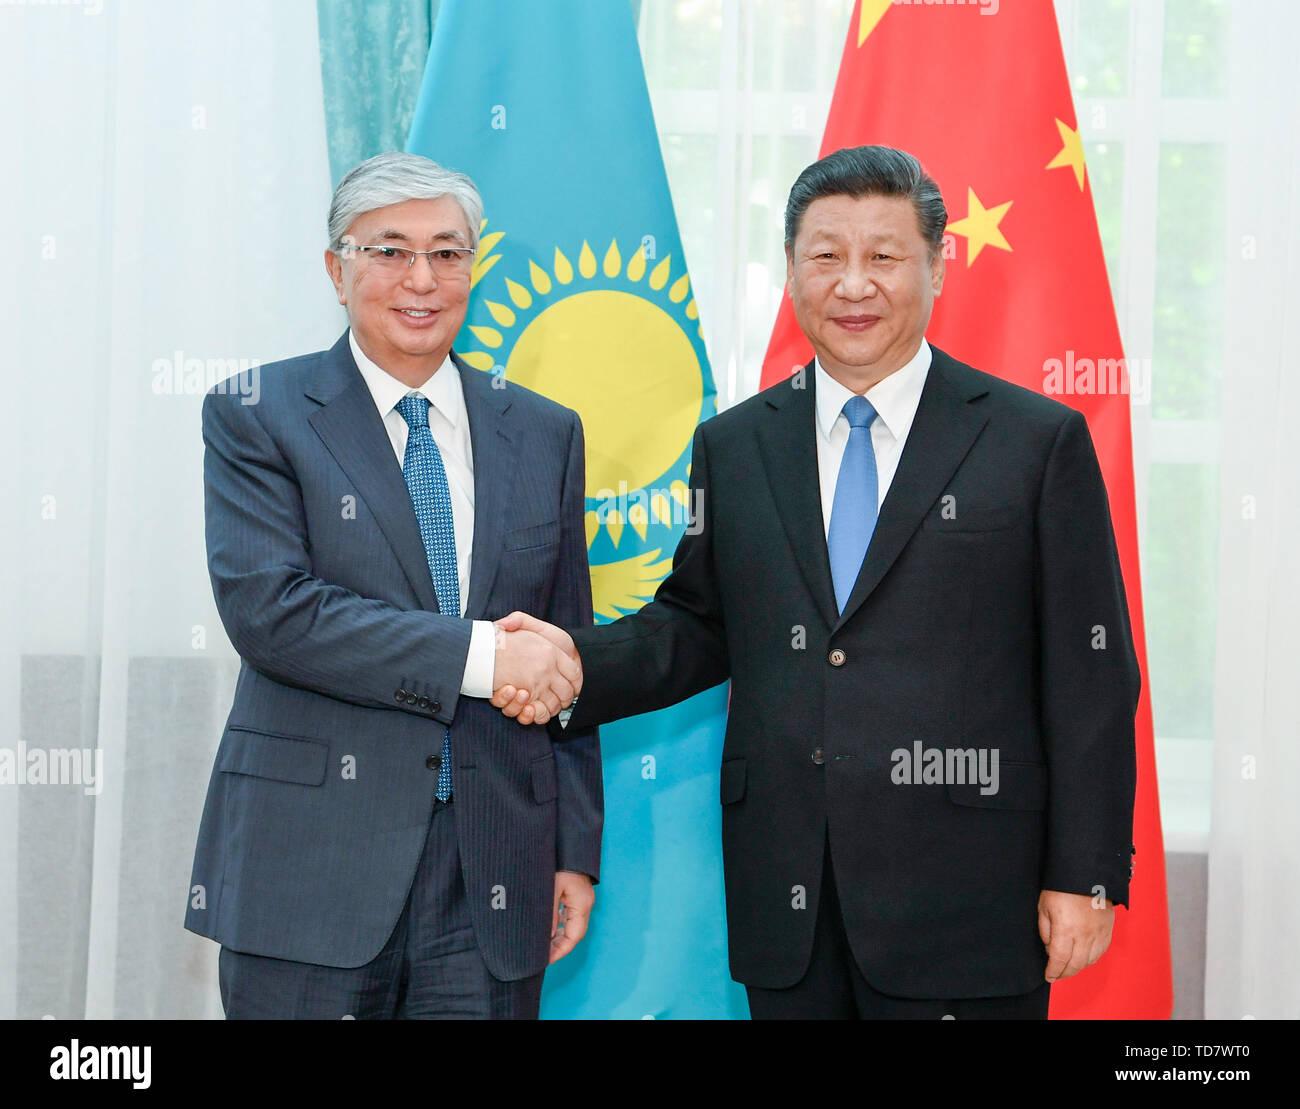 Bishkek, Kyrgyzstan. 13th June, 2019. Chinese President Xi Jinping meets with his Kazakh counterpart Kassym-Jomart Tokayev in Bishkek, Kyrgyzstan, June 13, 2019. Credit: Gao Jie/Xinhua/Alamy Live News - Stock Image